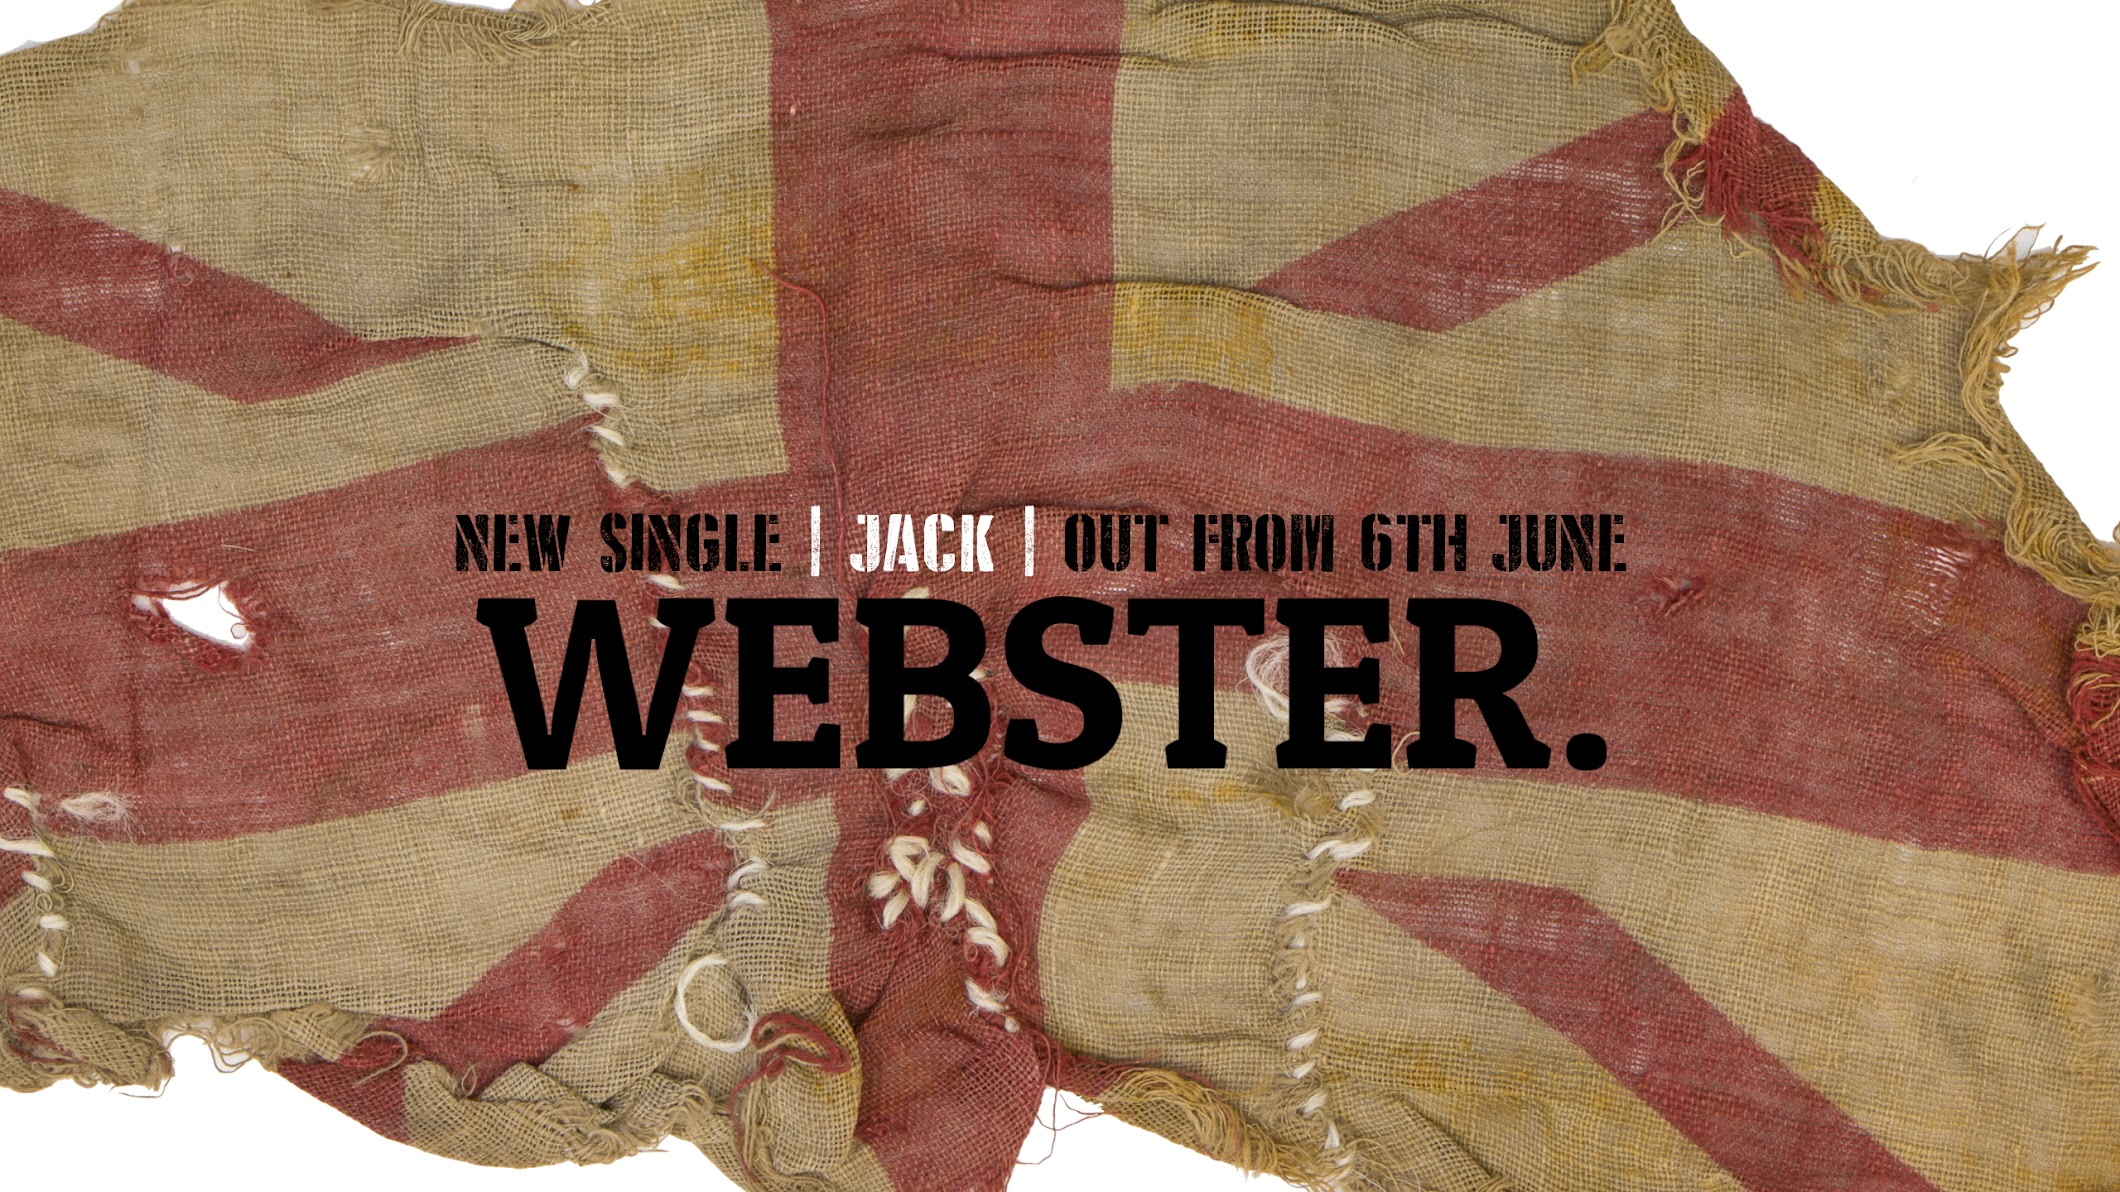 Webster Music Videos & Previews